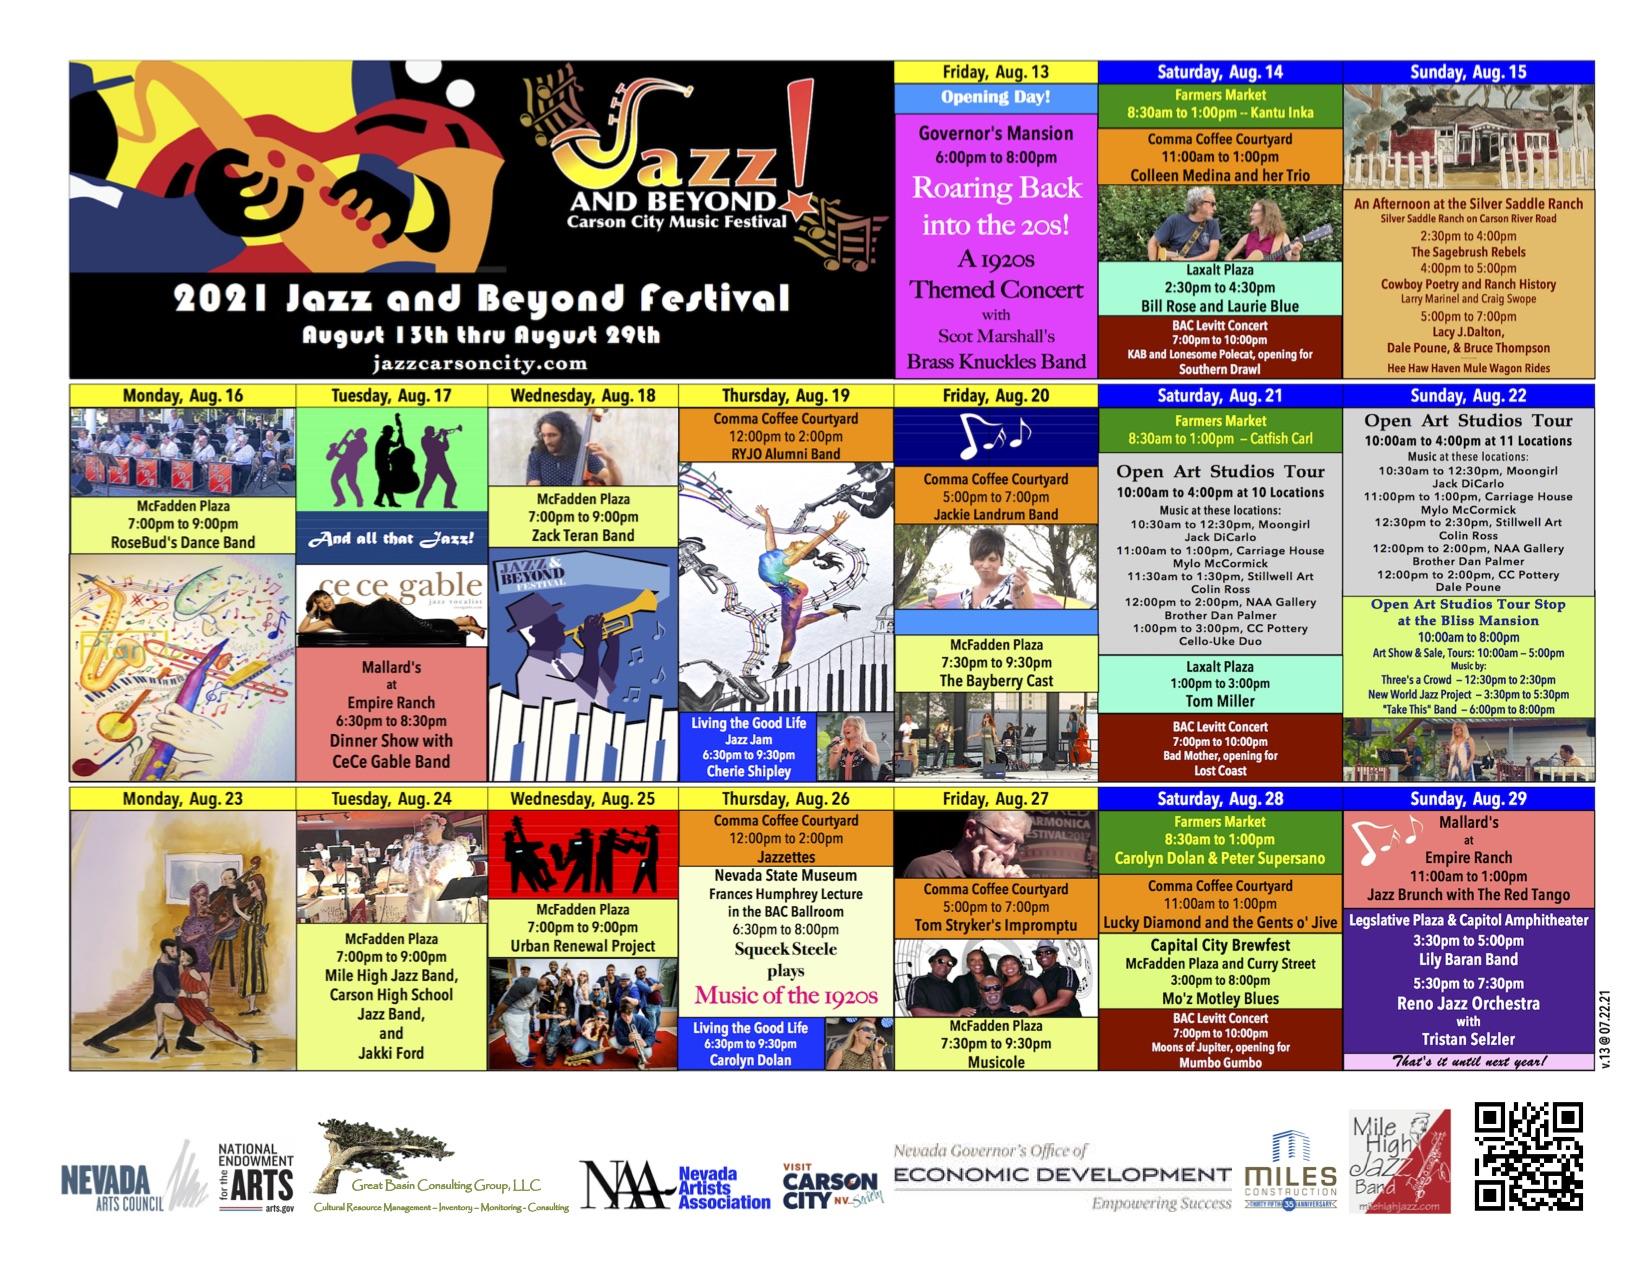 Jazz & Beyond 2021 Events